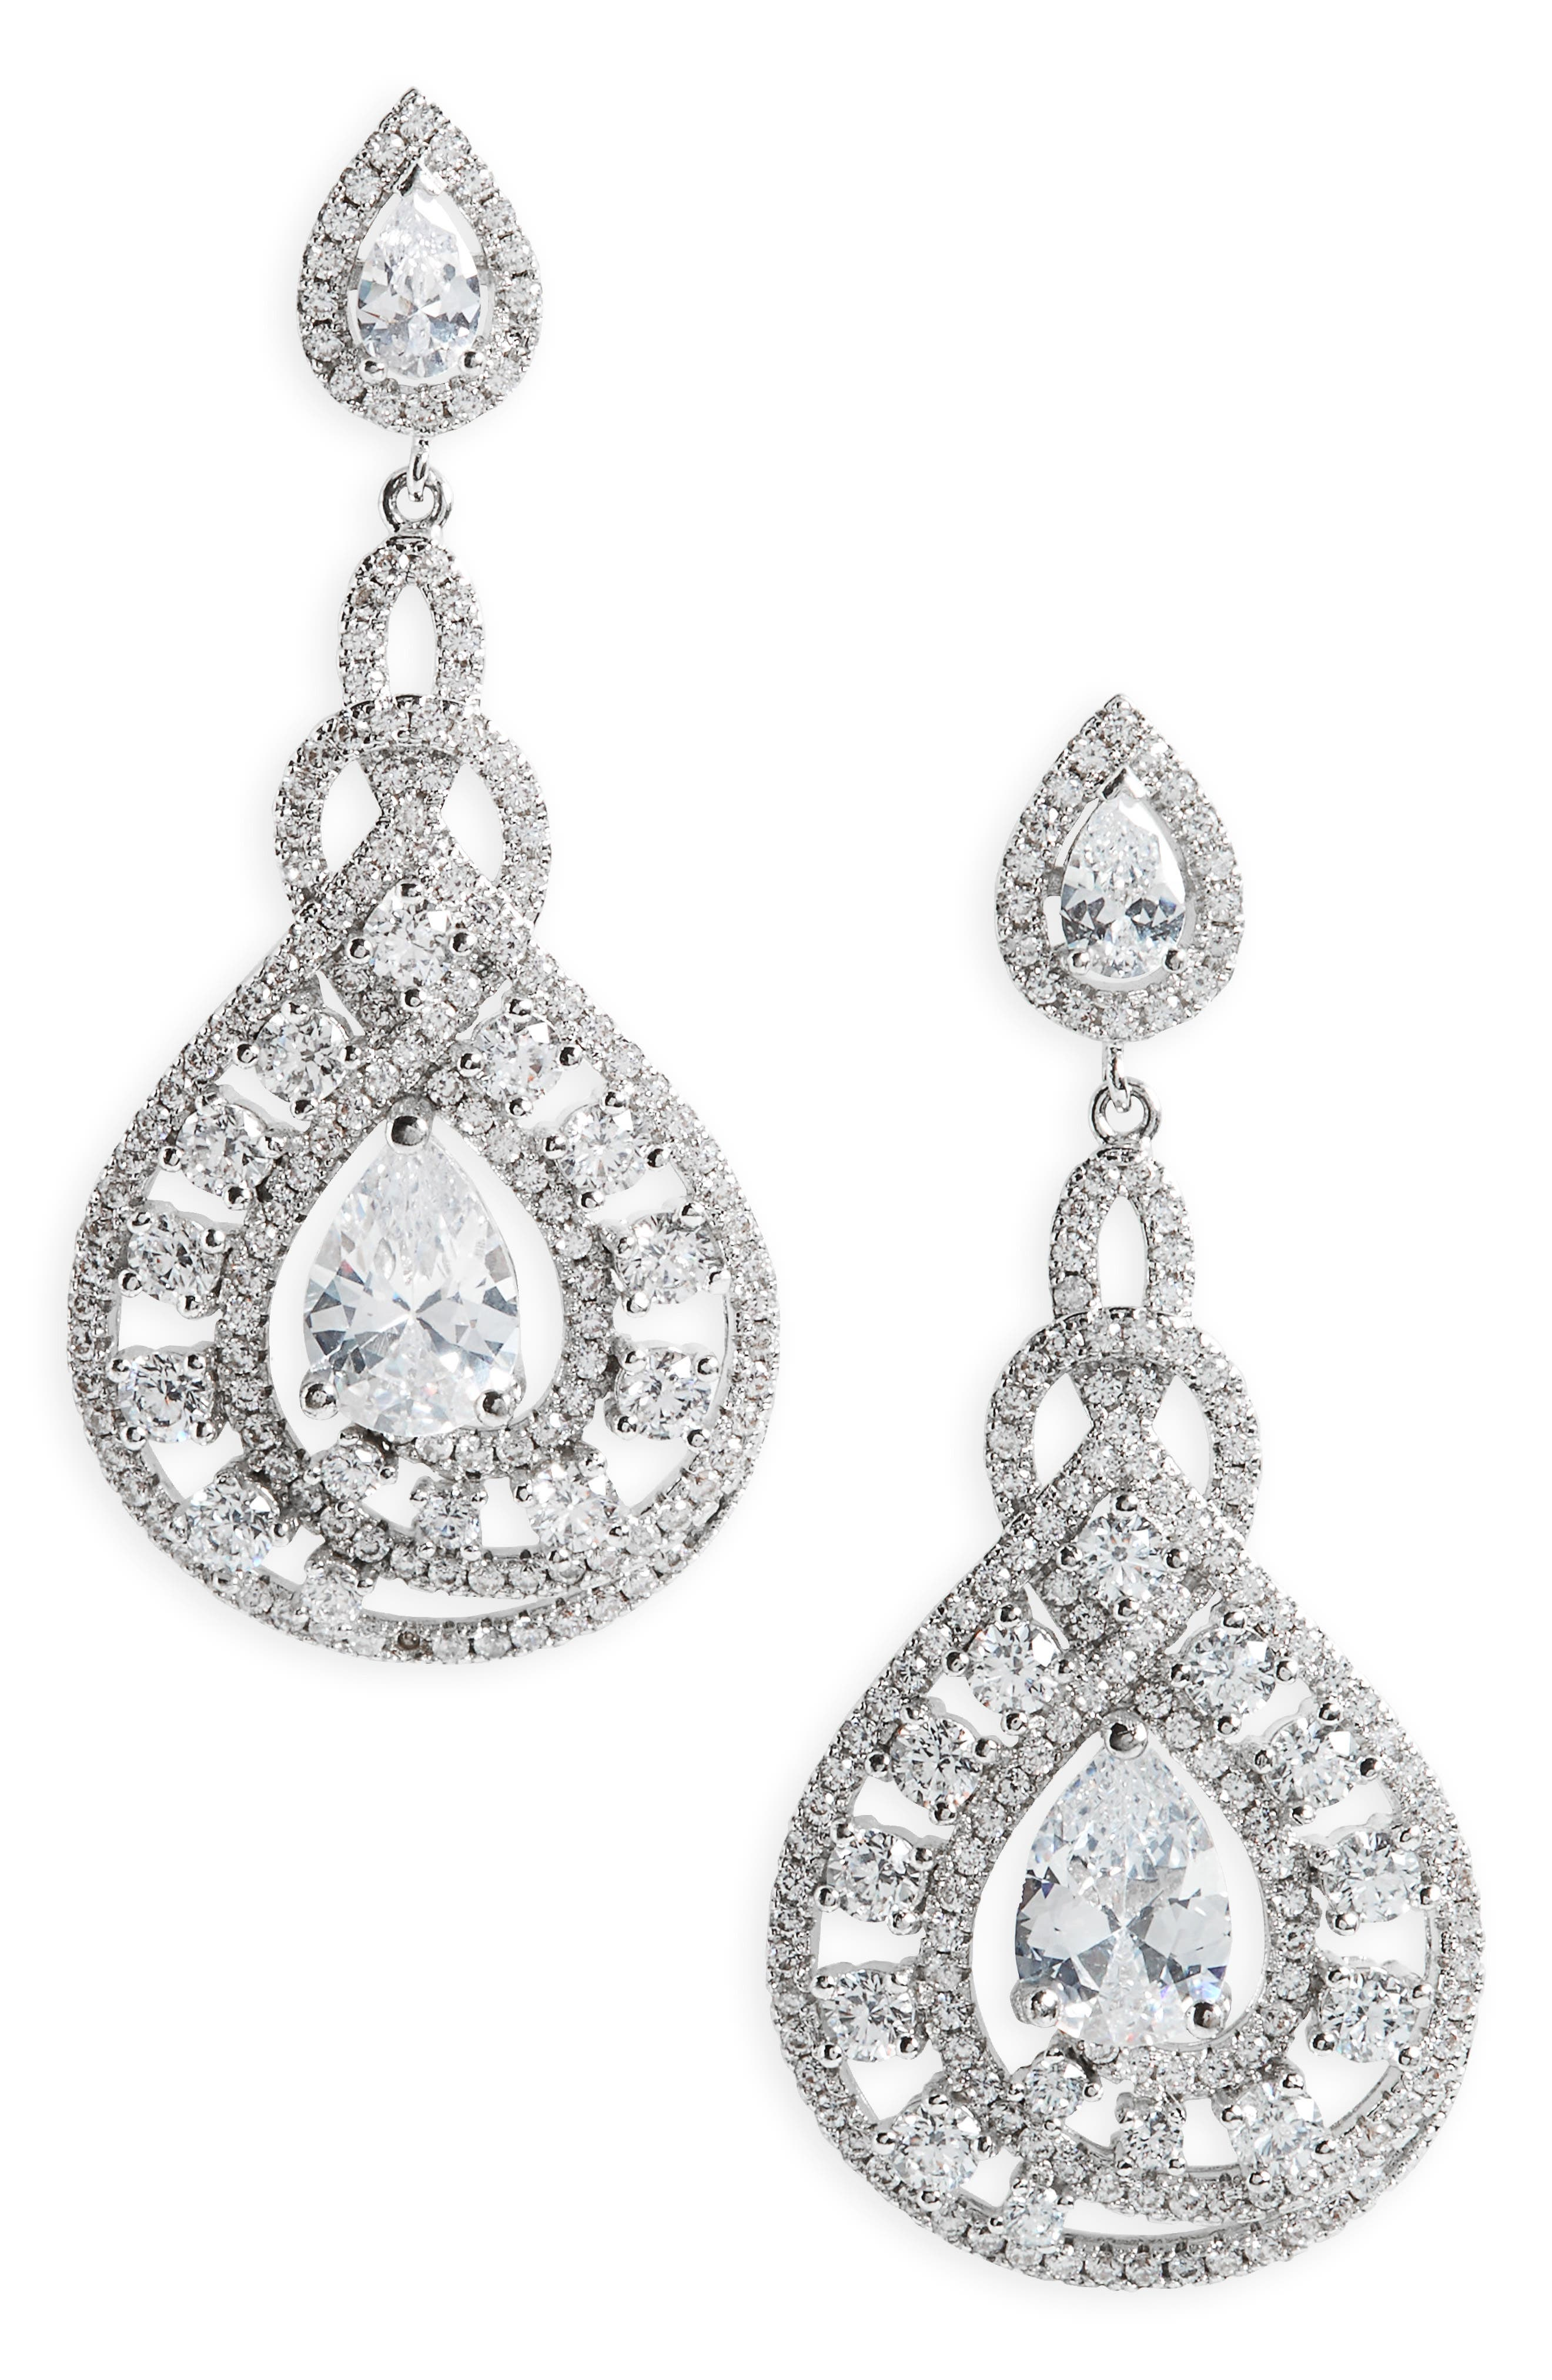 Glamorous Drop Earrings,                         Main,                         color, Silver